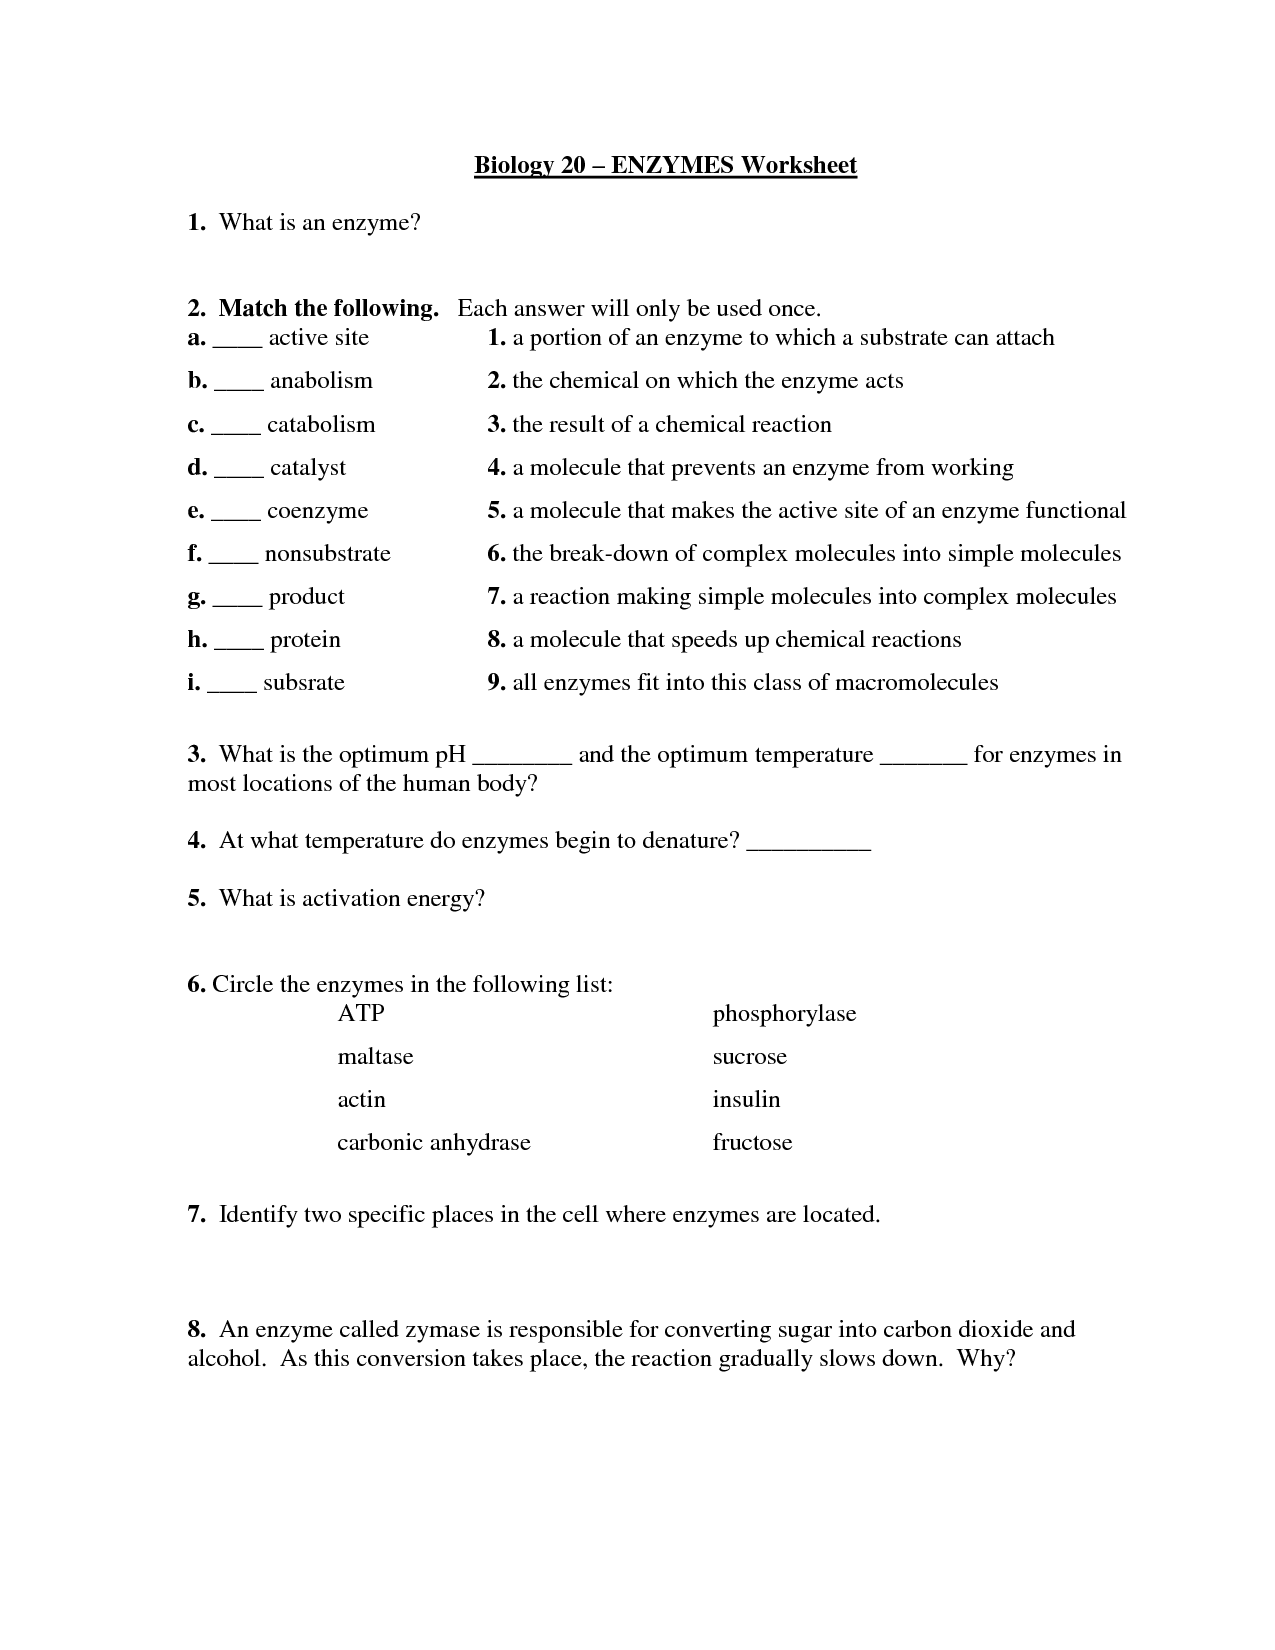 Dinsores Printable Worksheet Middle School Biology